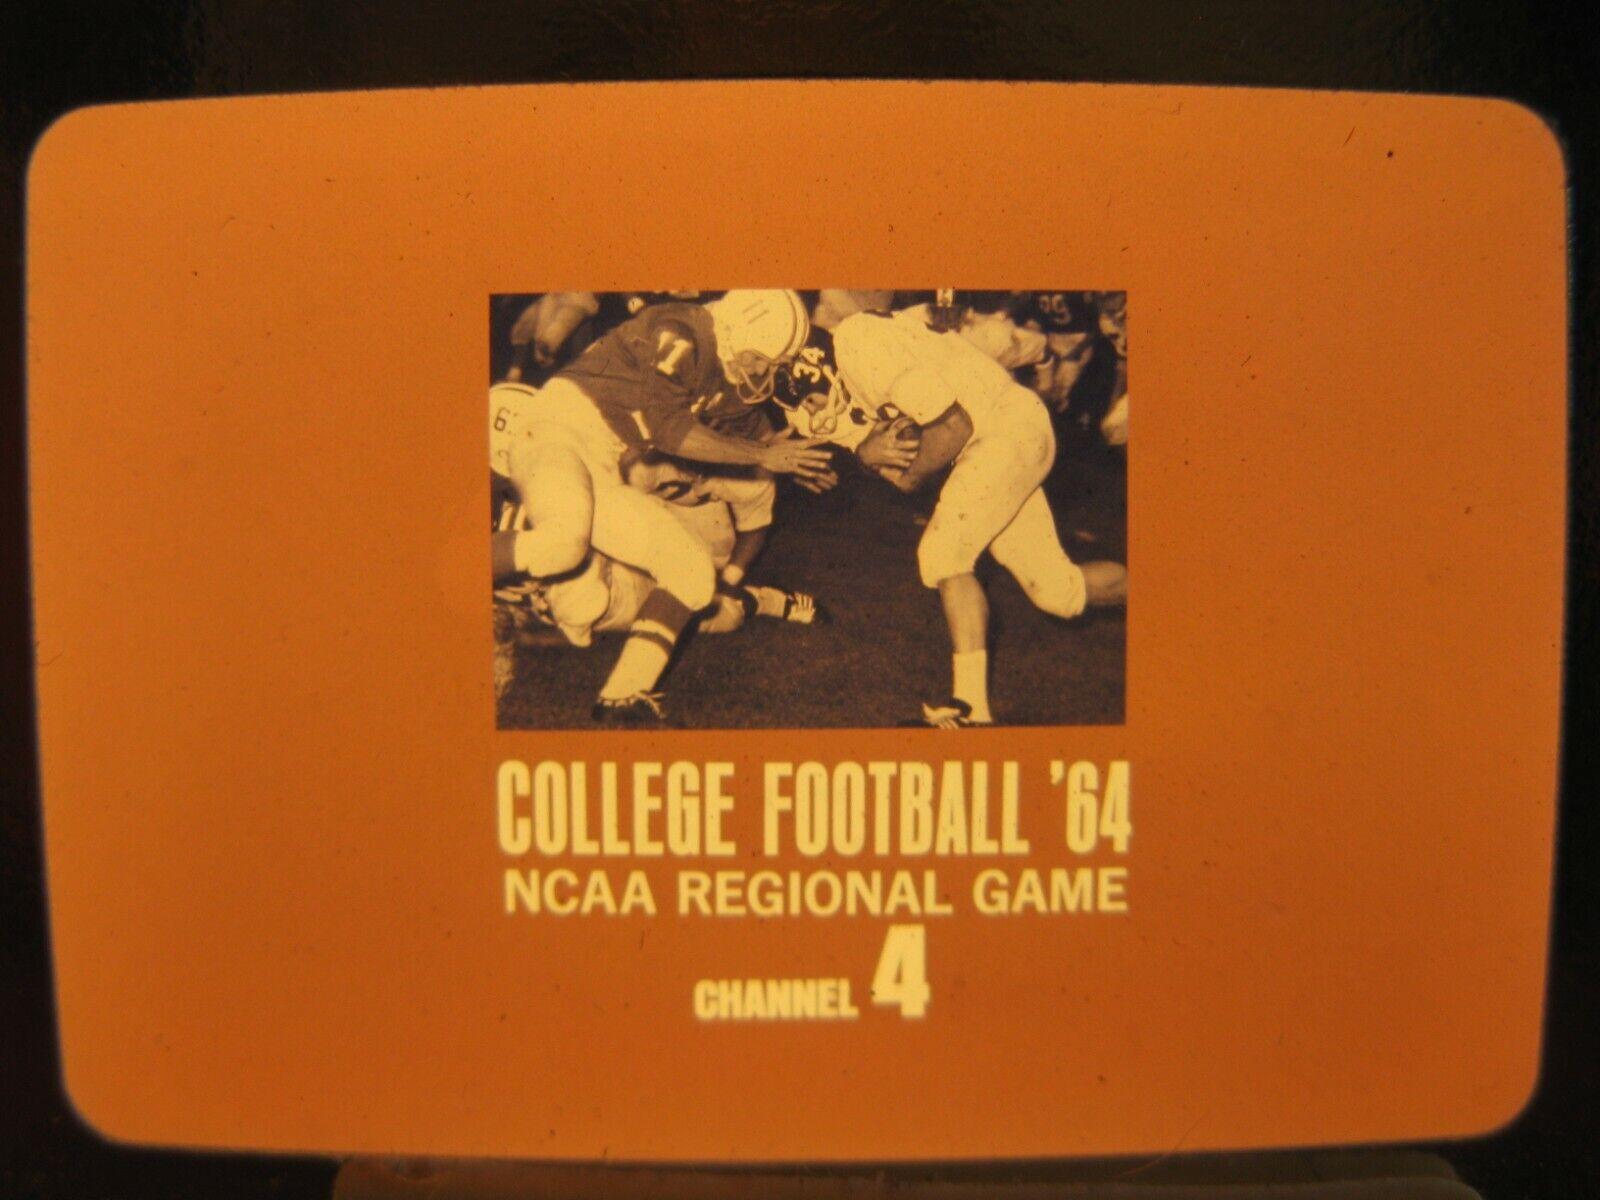 Vintage college football promo~ 1964 ncaa regional game~ nbc advertisement~ orig